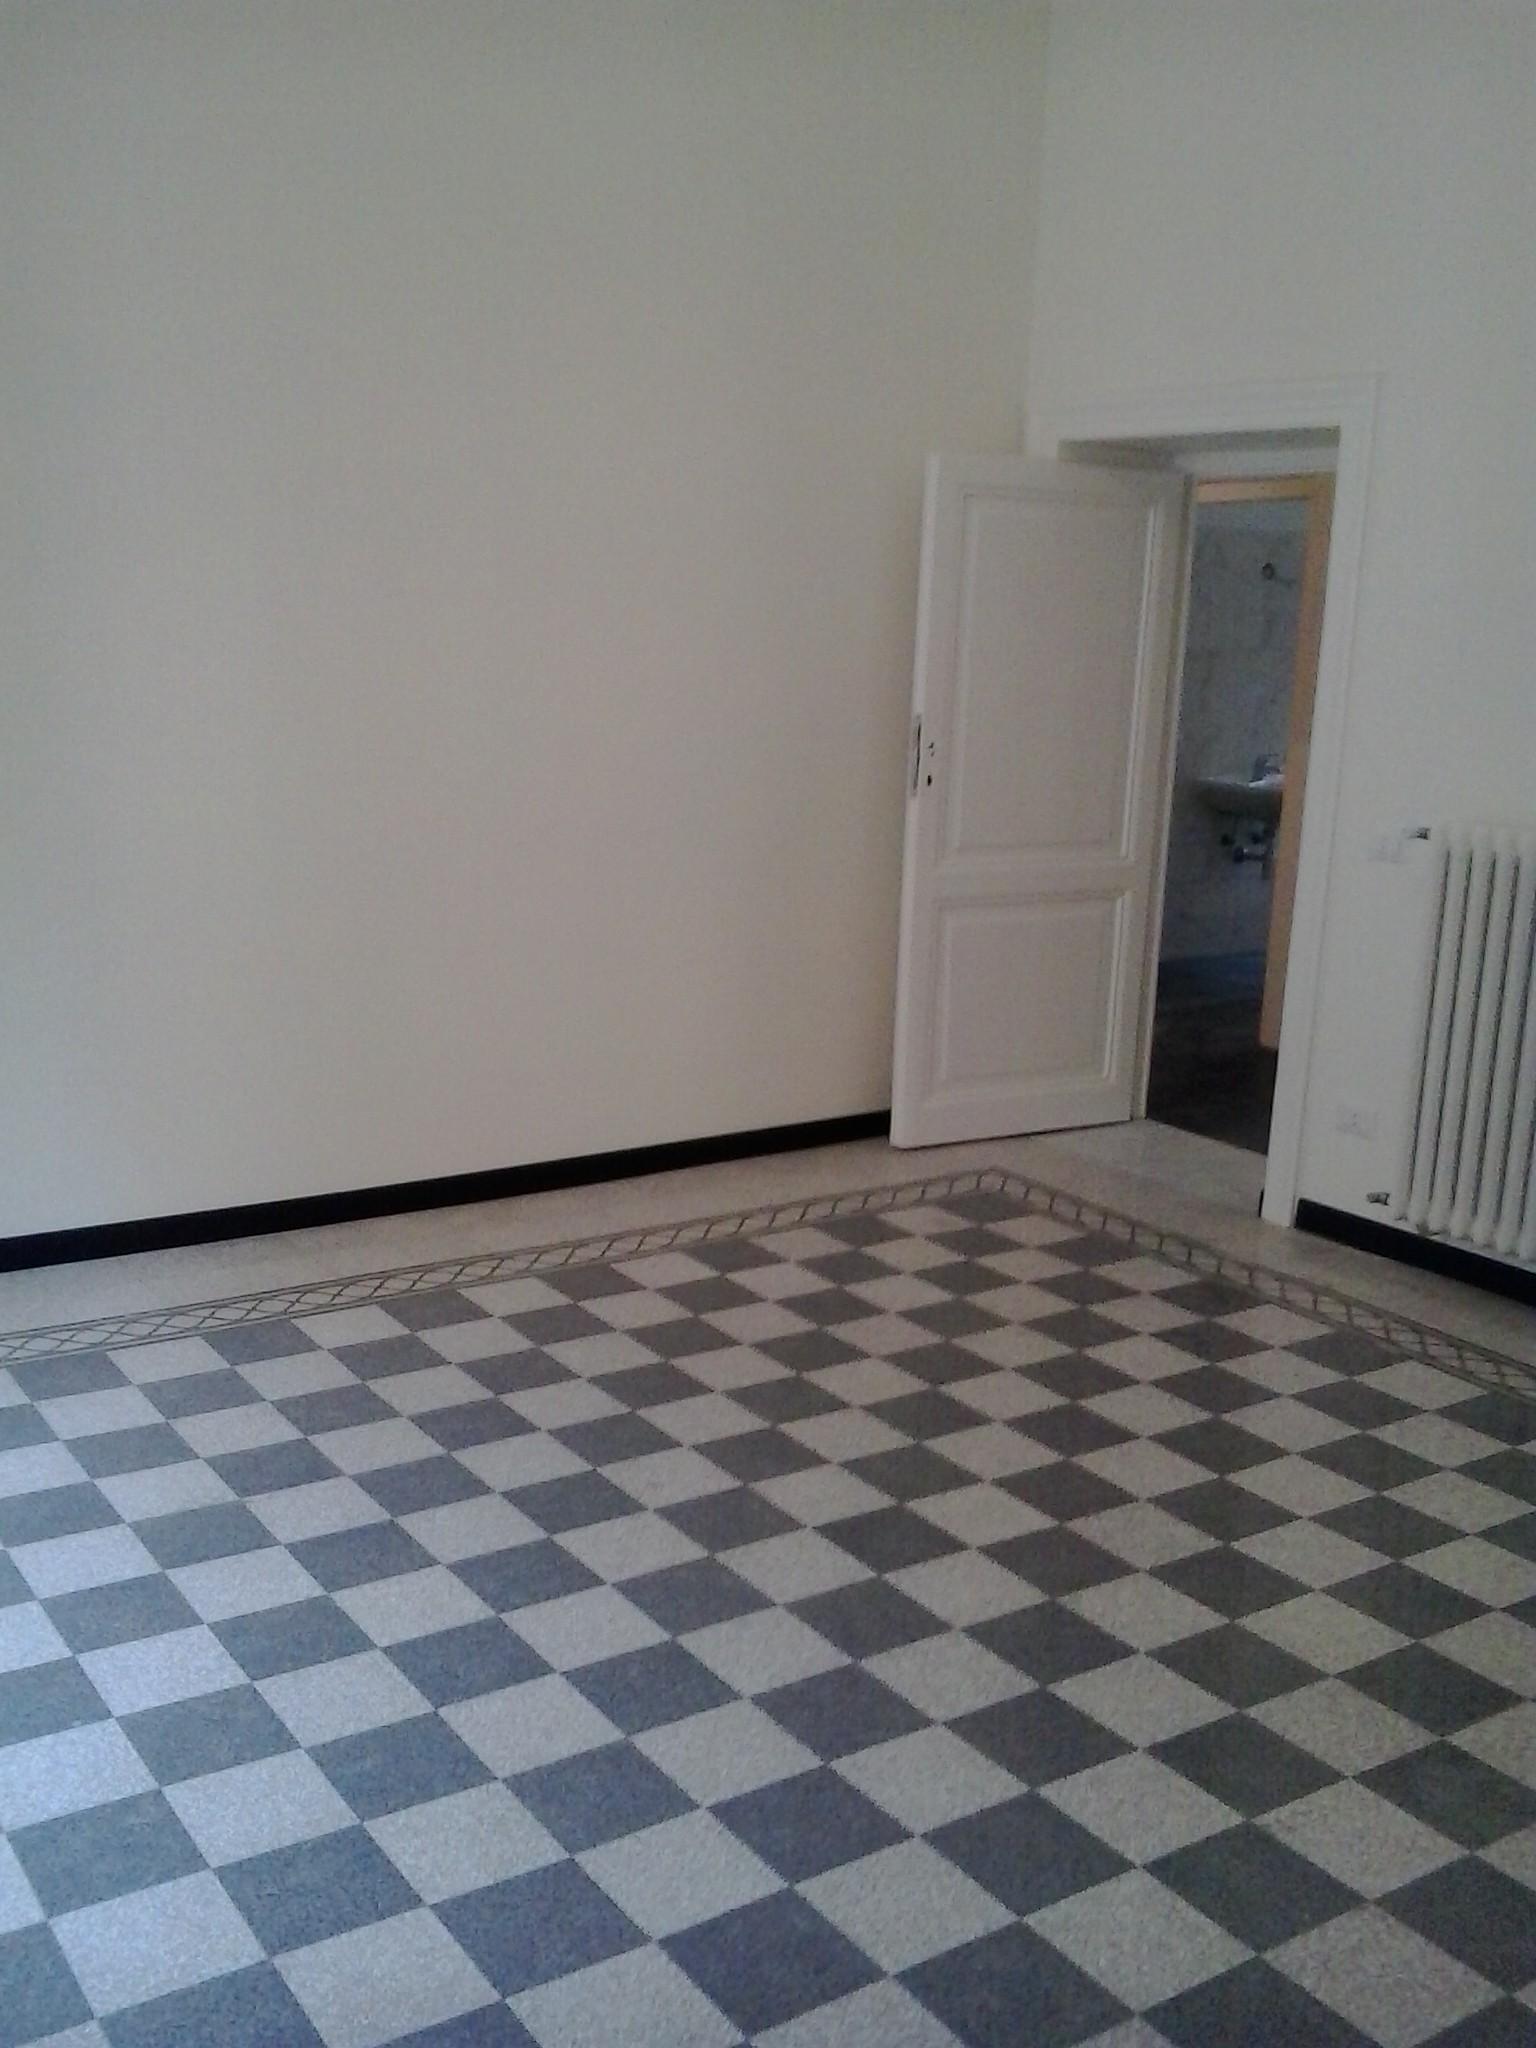 Affittasi location appartamento roma zona praticola di for Affittasi studio roma prati